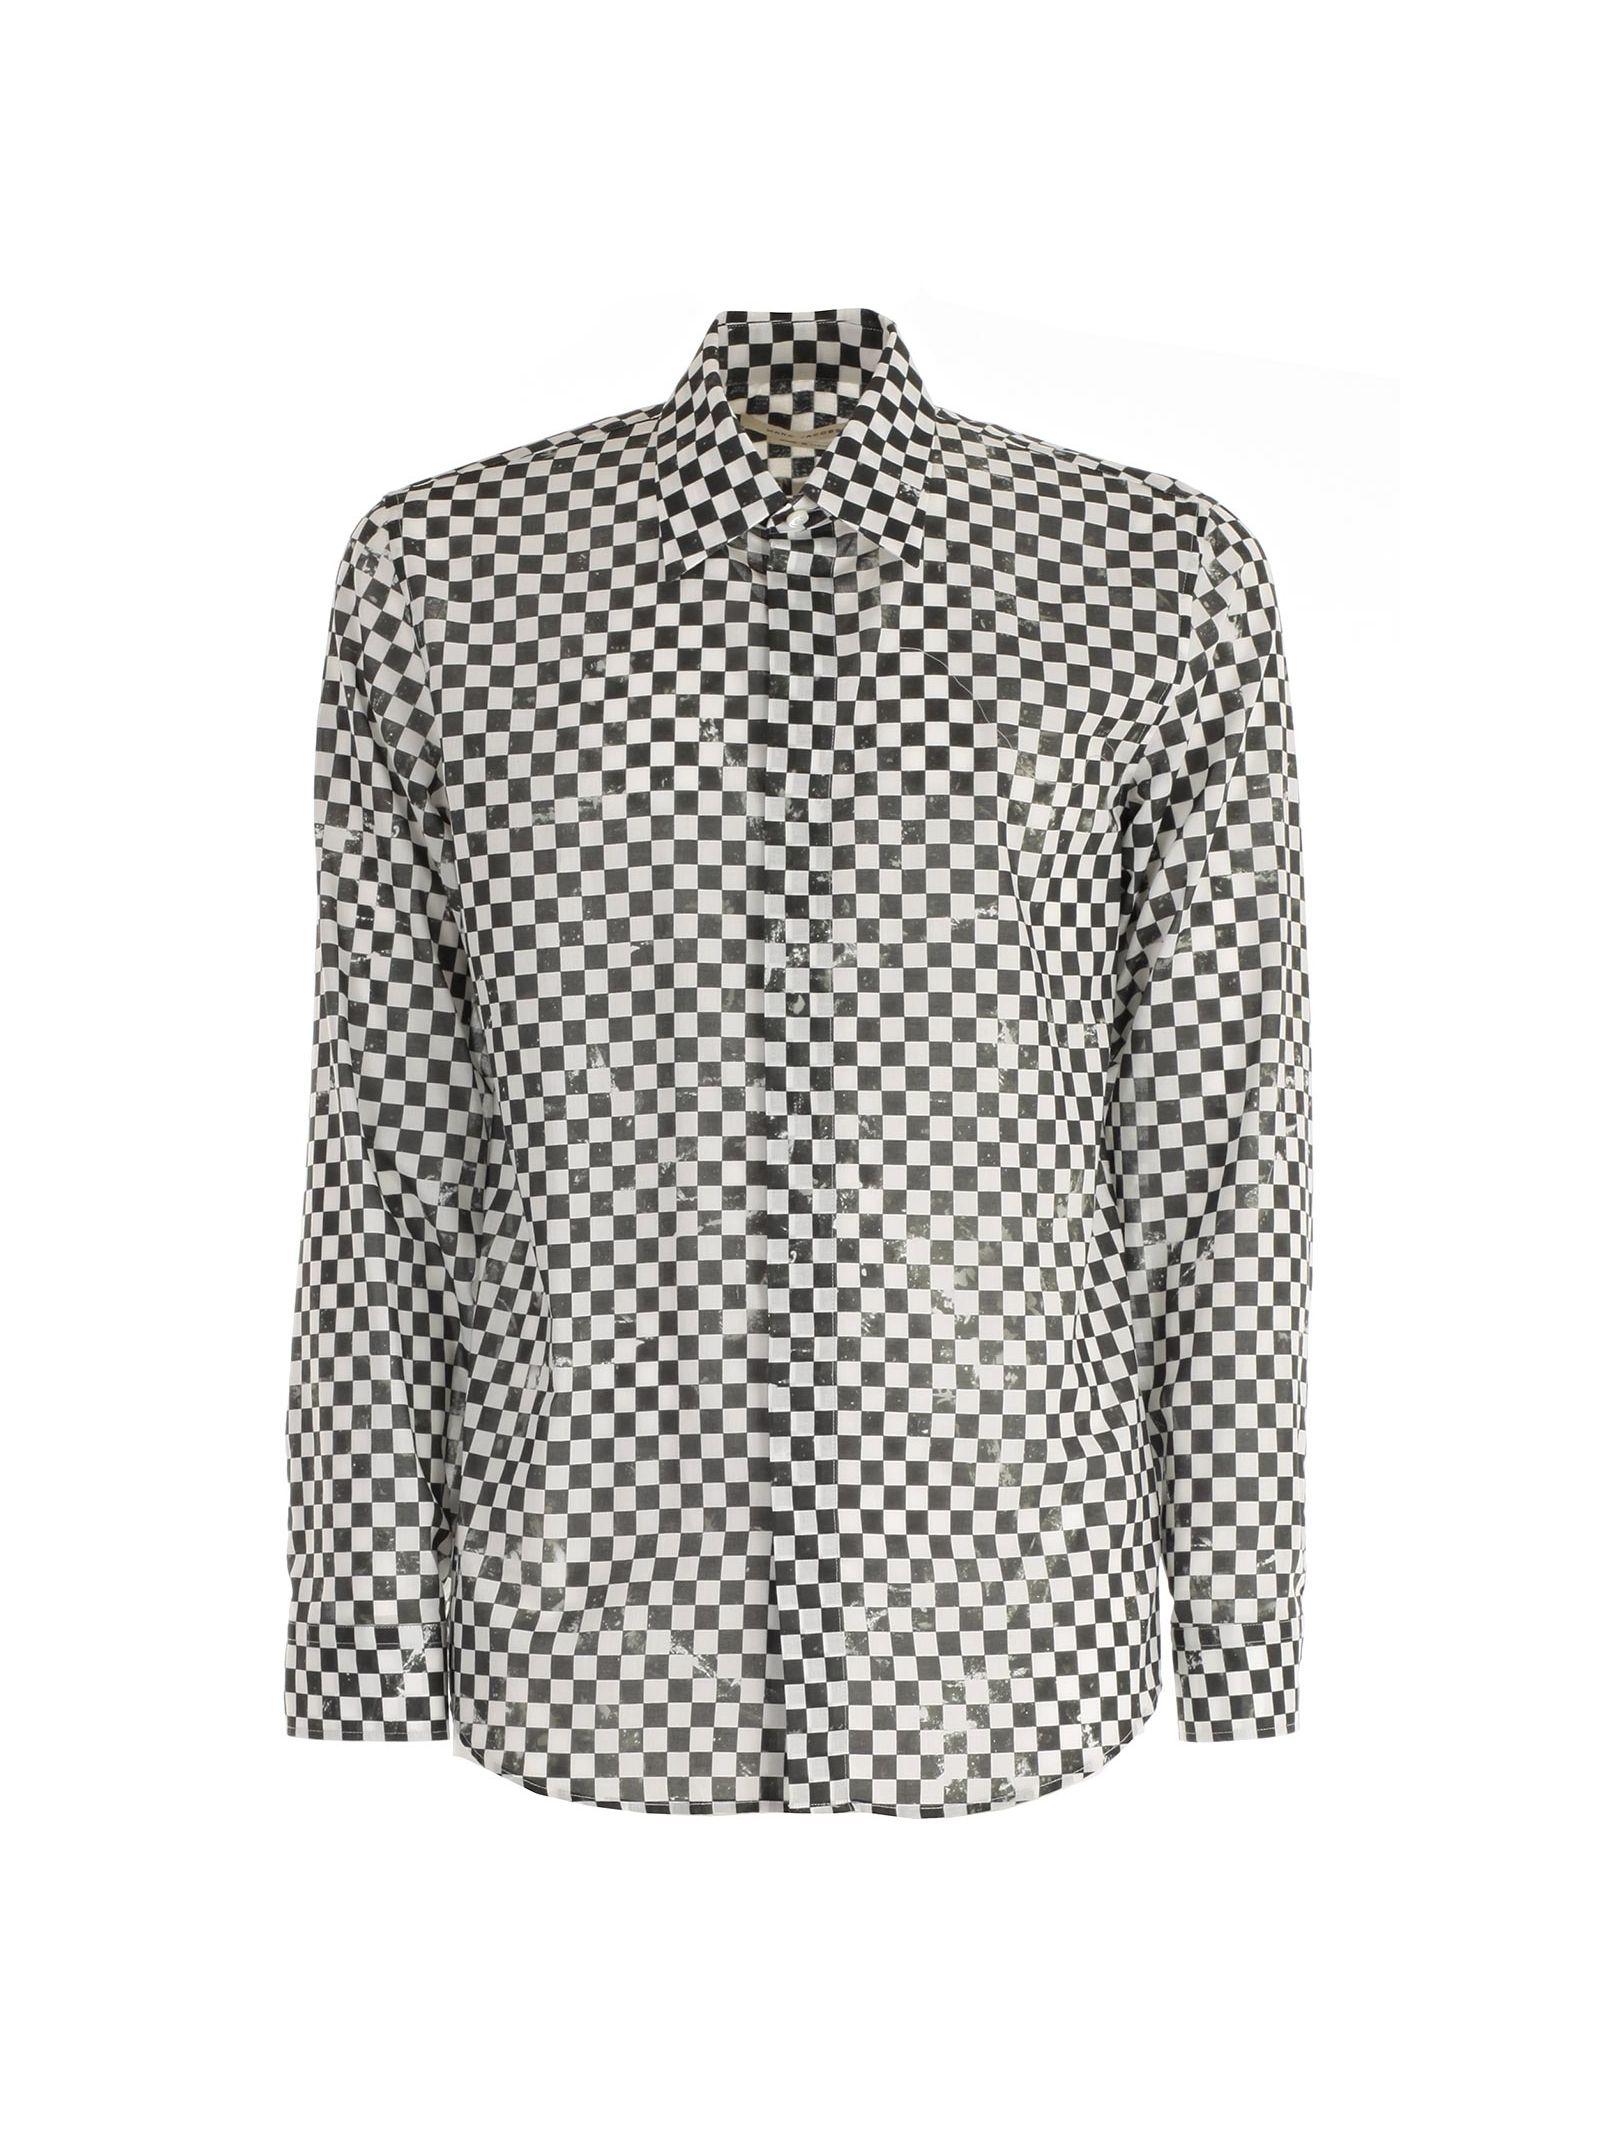 marc jacobs male marc jacobs shirt